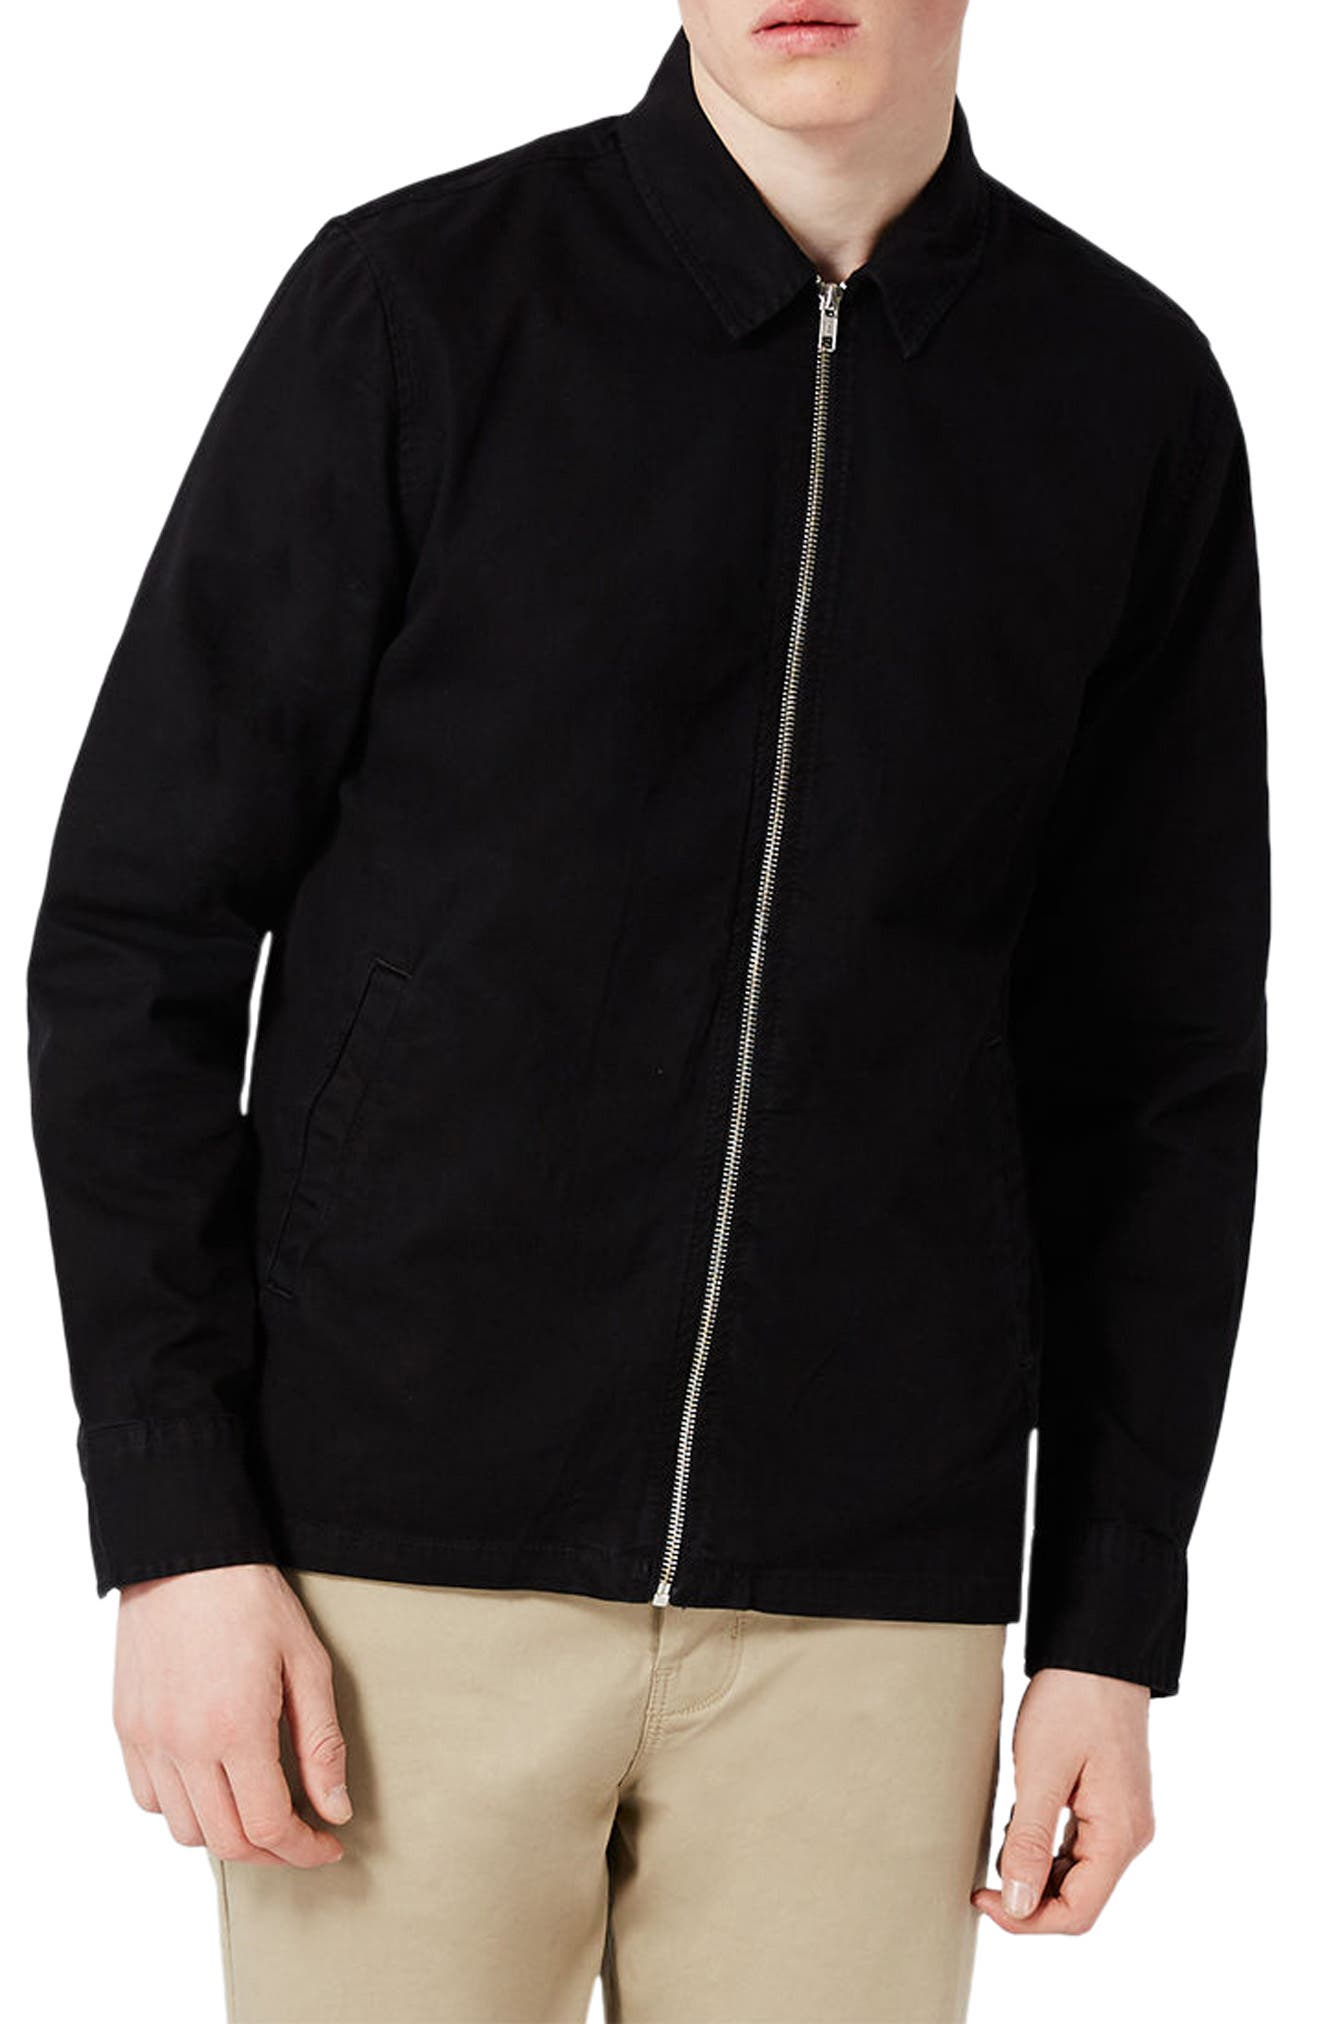 Alternate Image 1 Selected - Topman Herringbone Zip Shirt Jacket